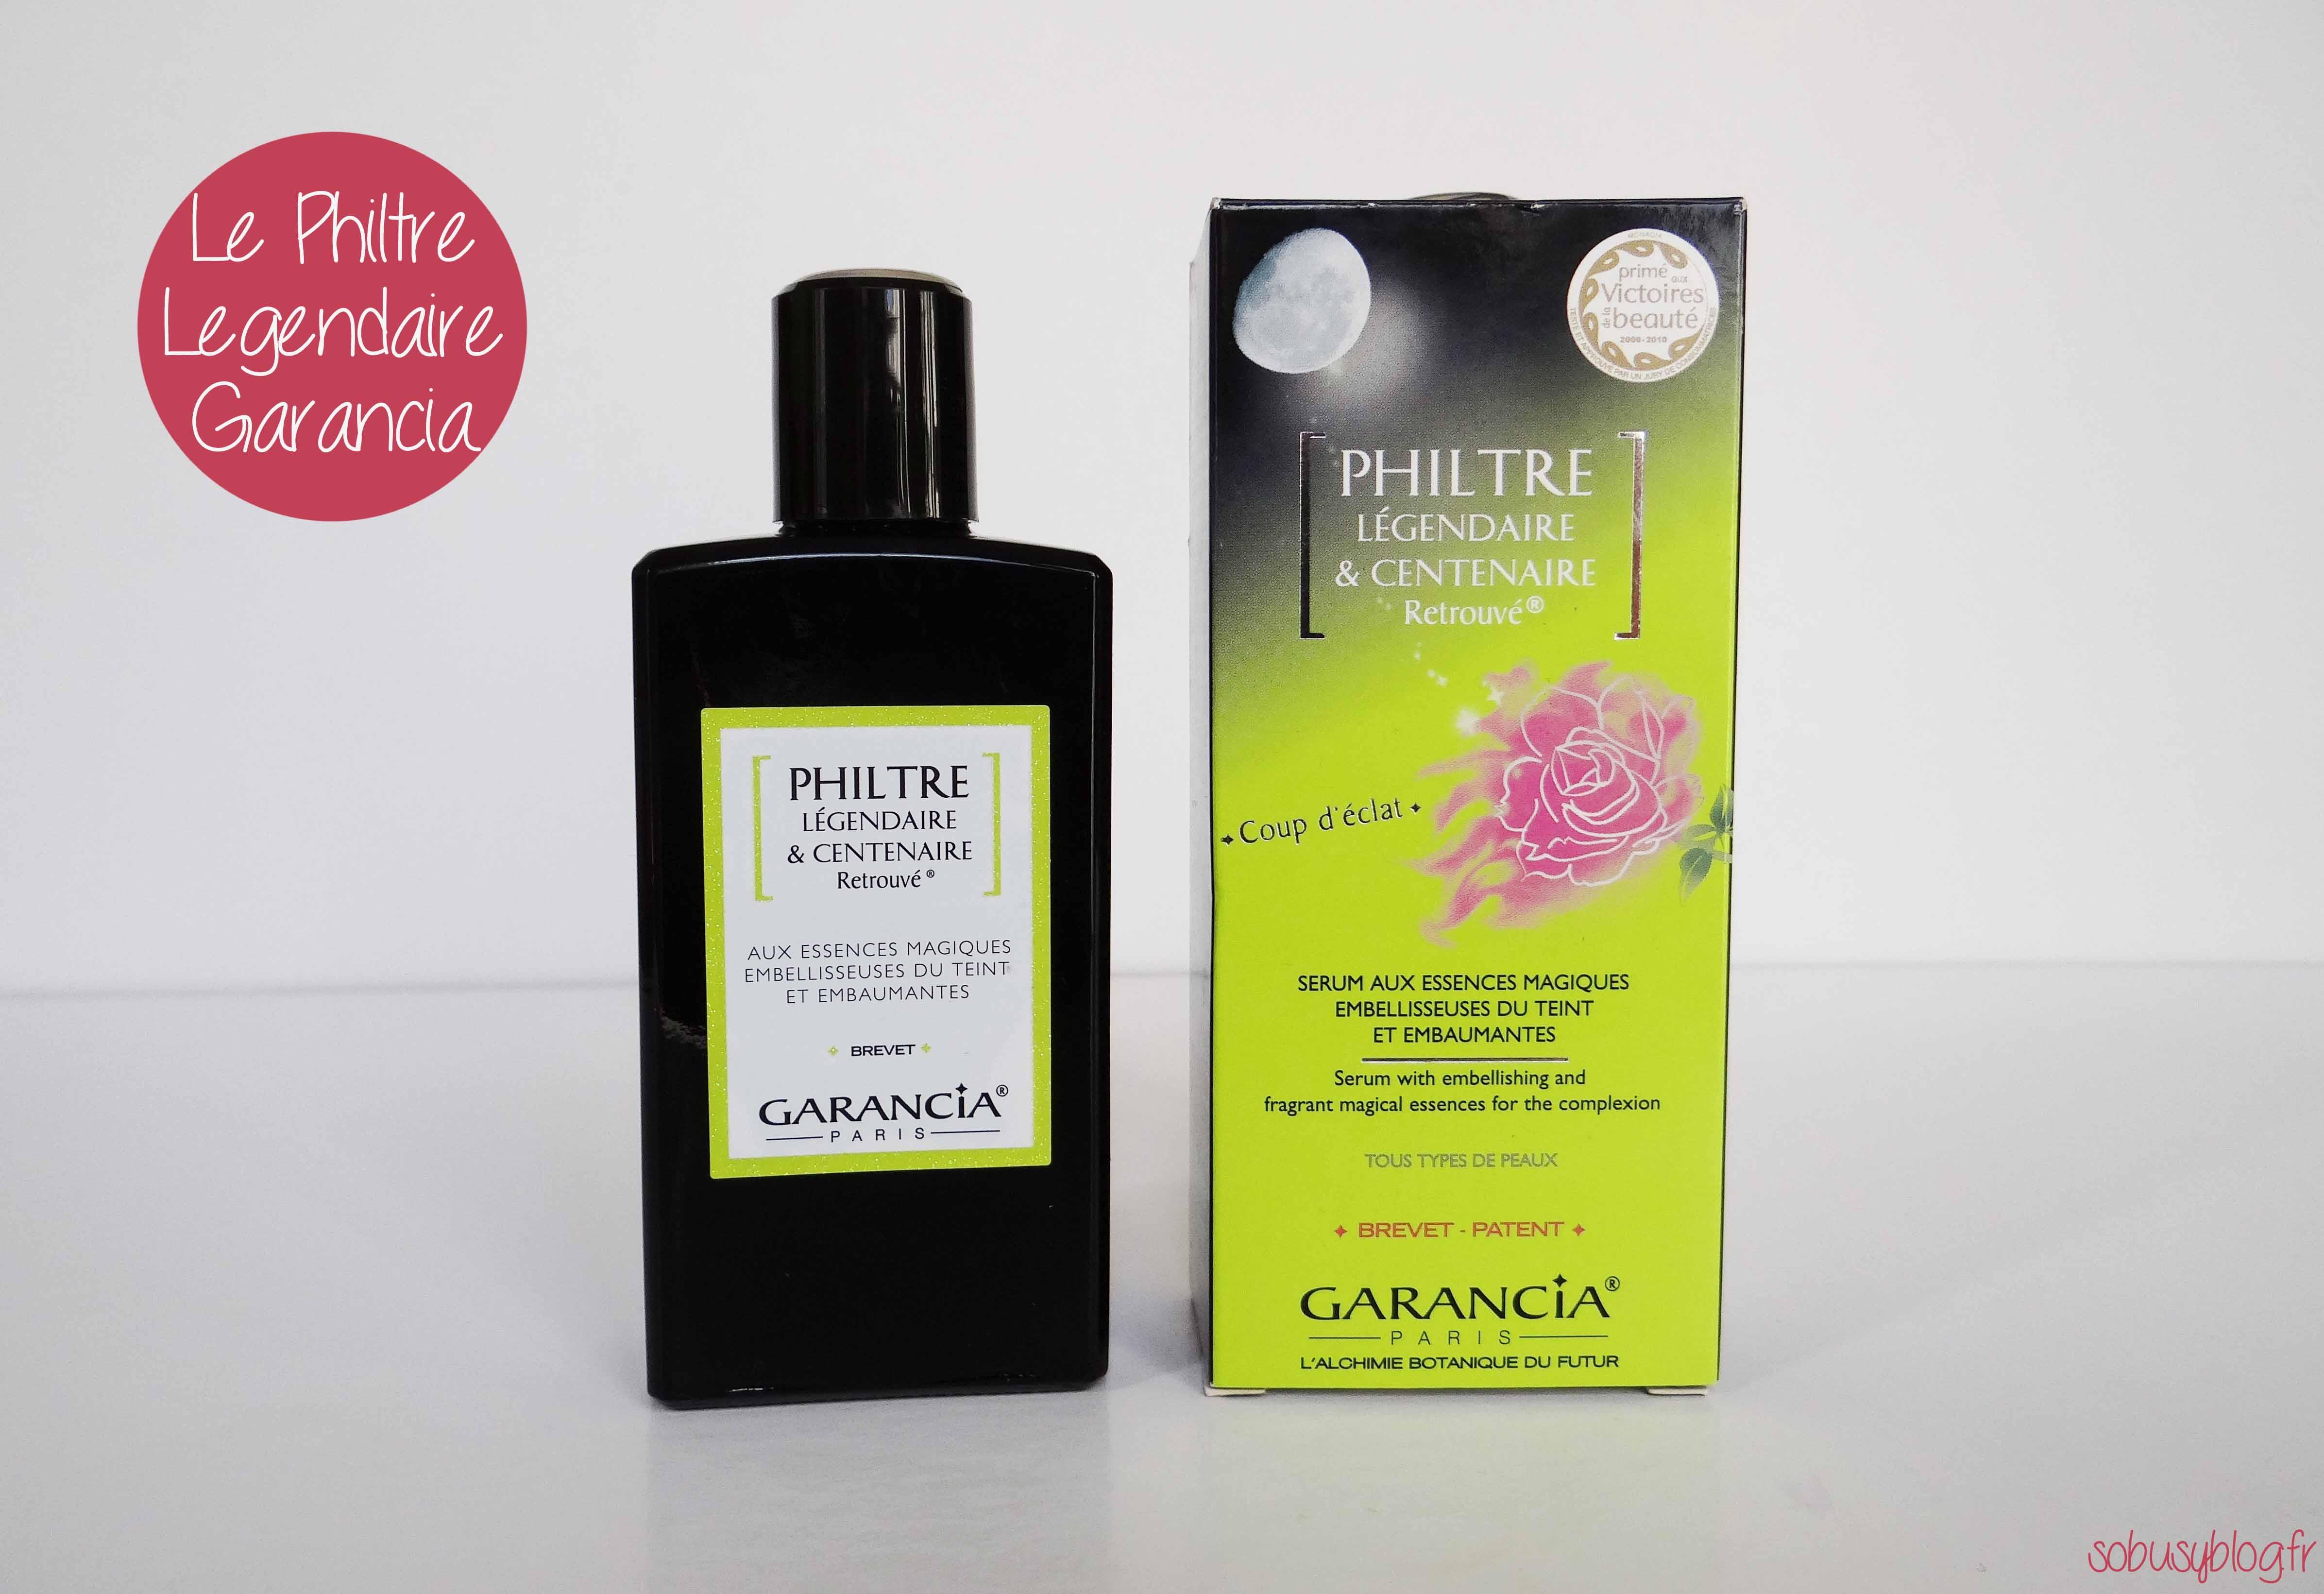 philtre-legendaire-coup-d-eclat-garancia-serum